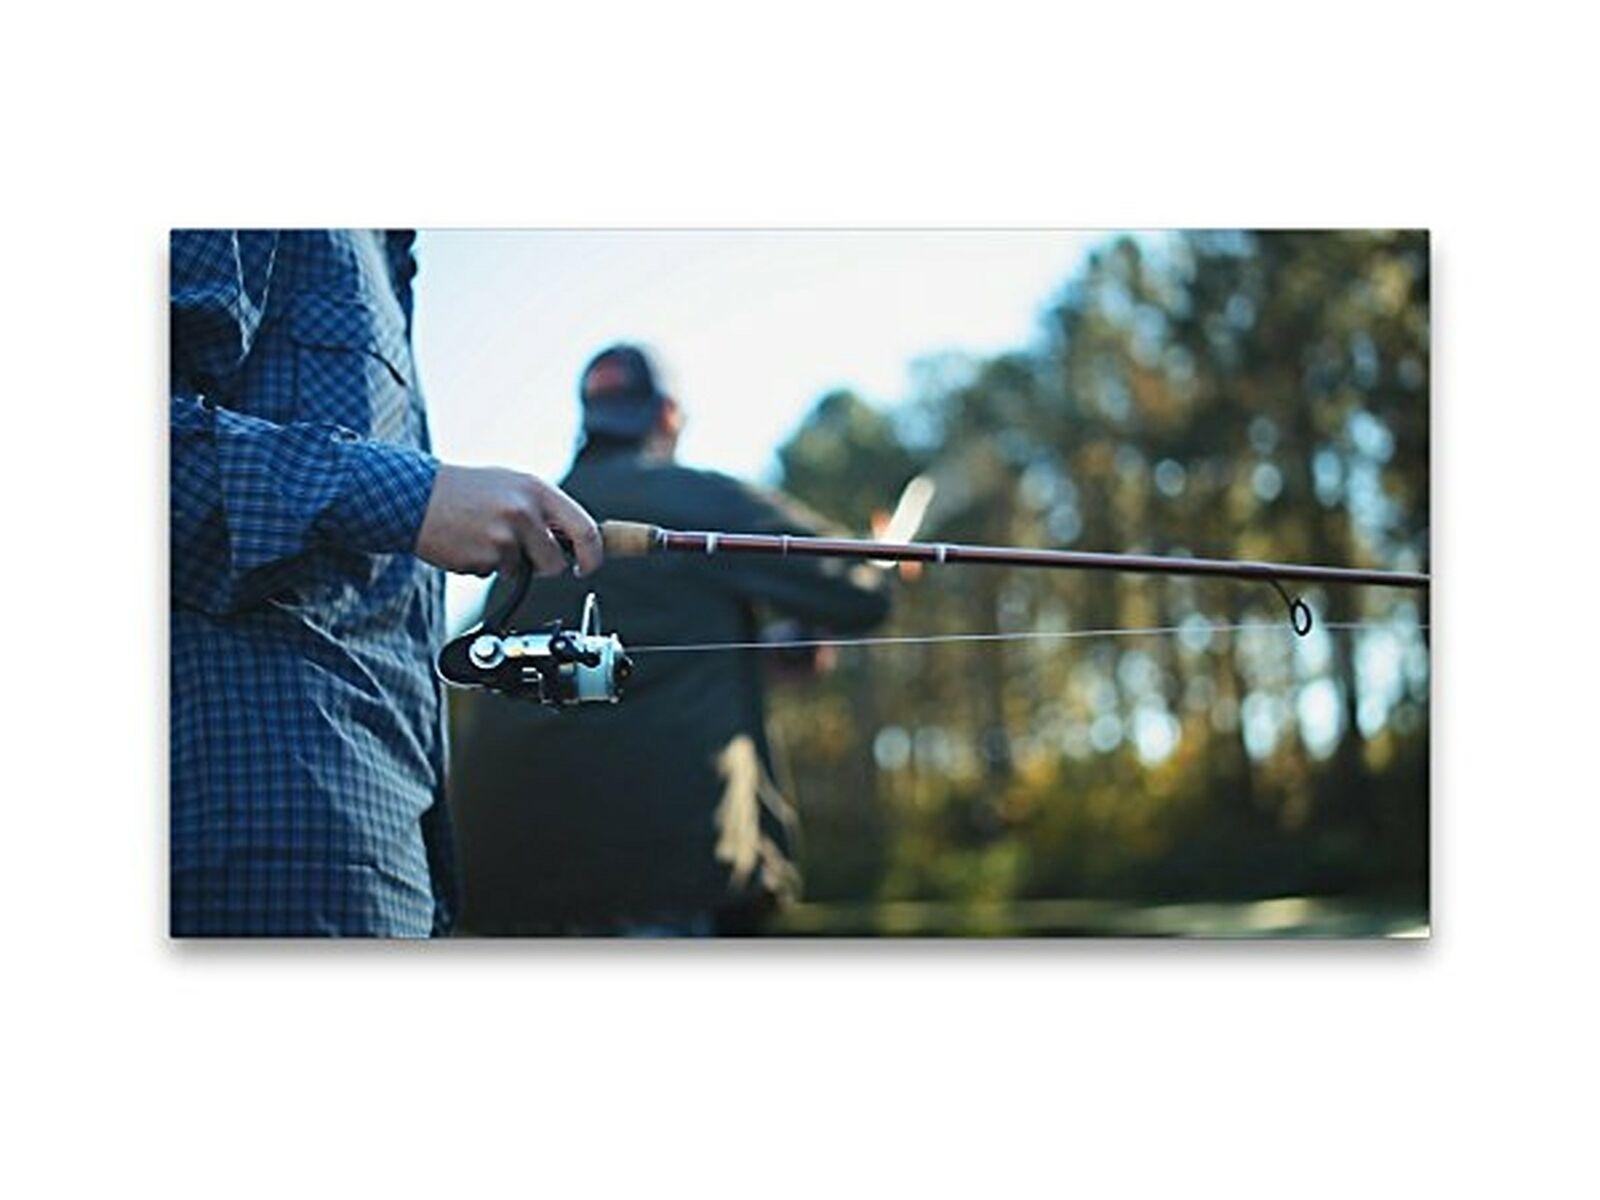 STREN HIGH IMPACT GREEN 2 SPOOLS OF 30LB TEST 400 YD MONOFILIMENT FISHING LINE